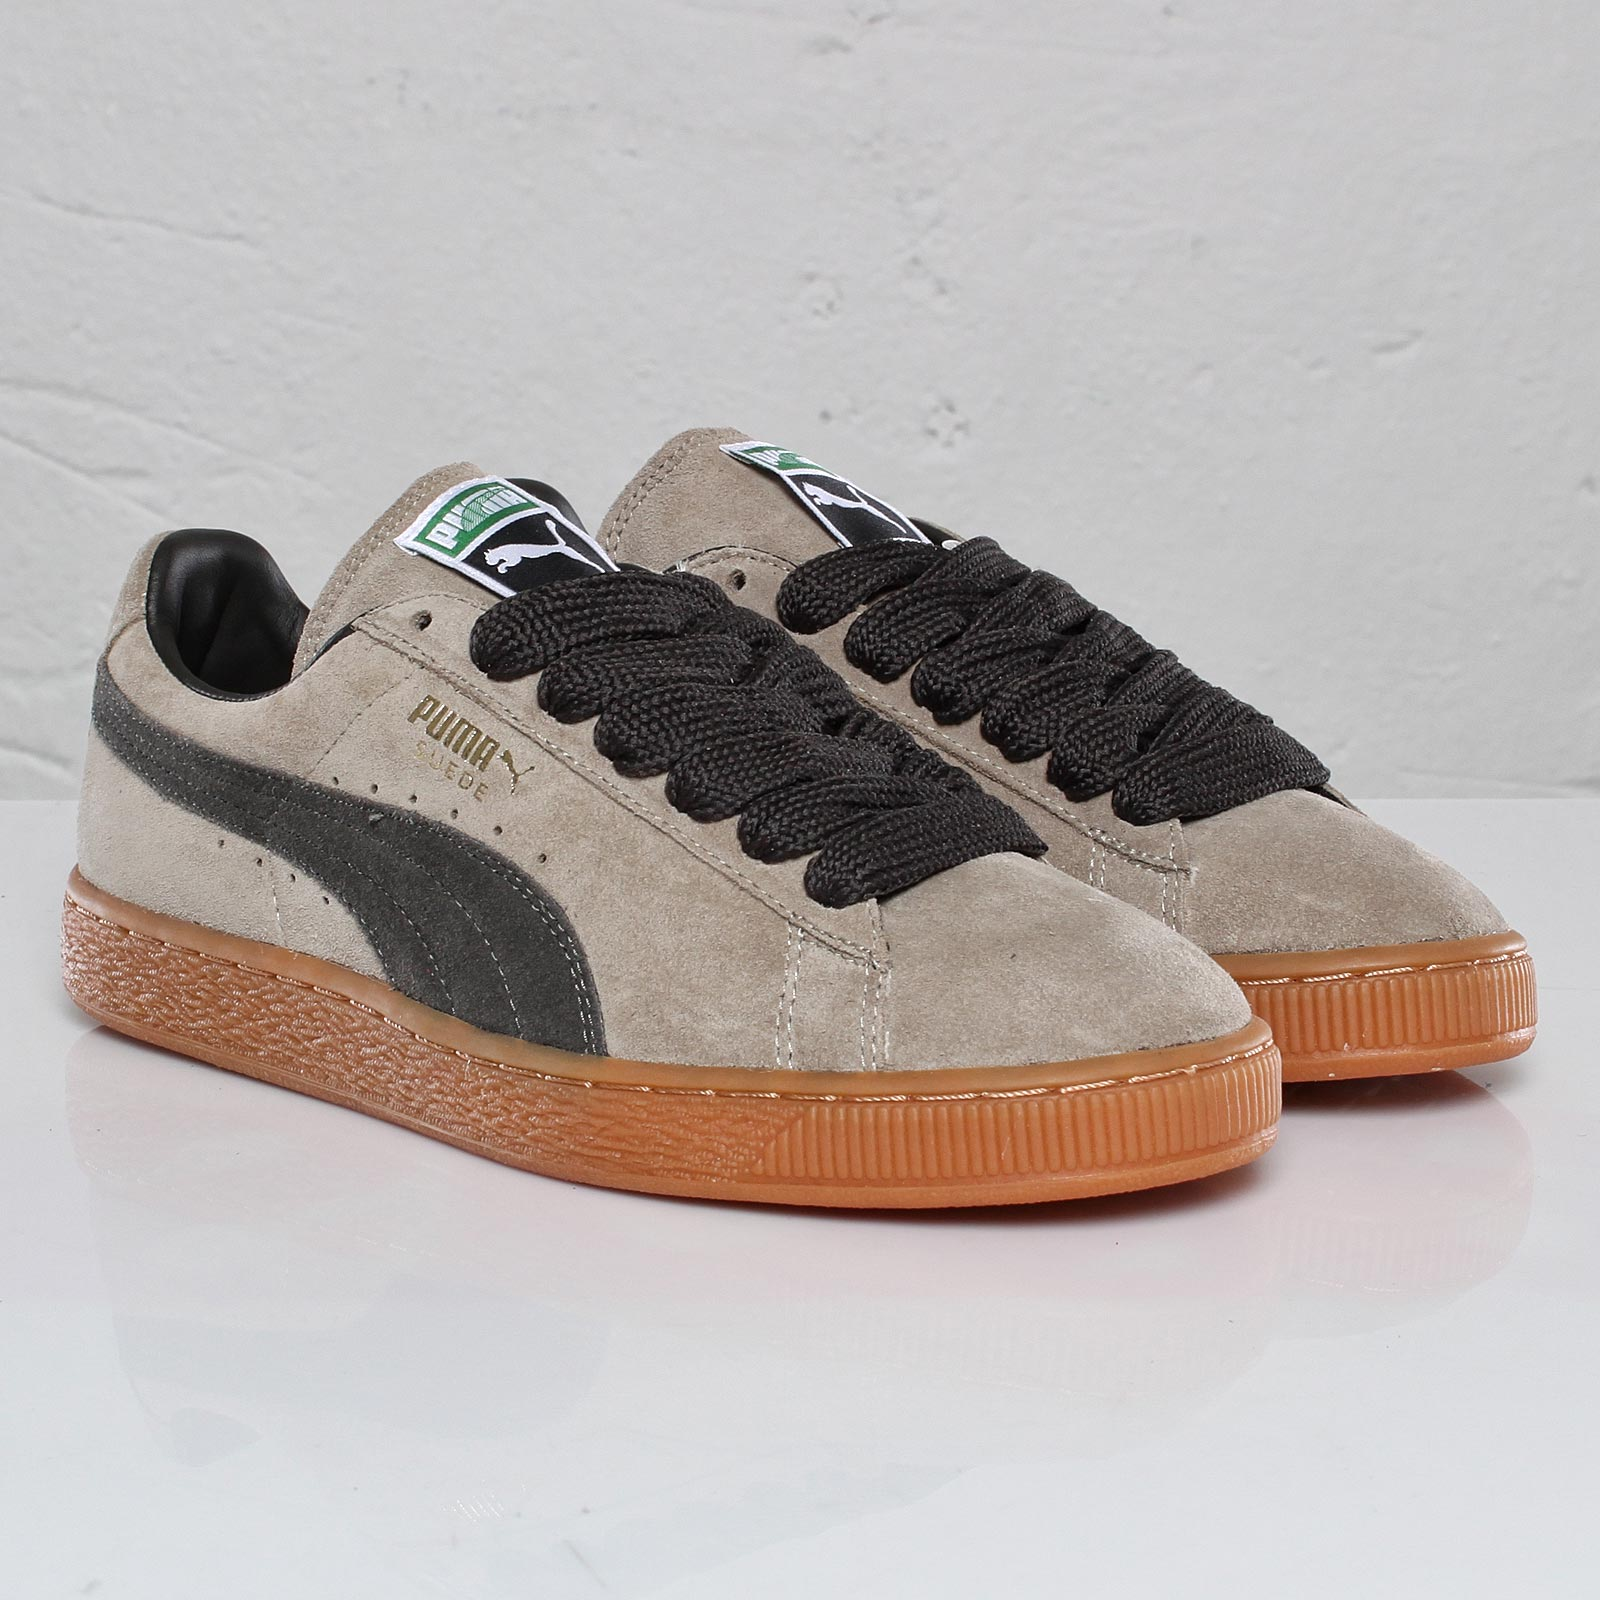 39f67bdc6b6 Puma Suede Classic ECO - 101610 - Sneakersnstuff | sneakers ...